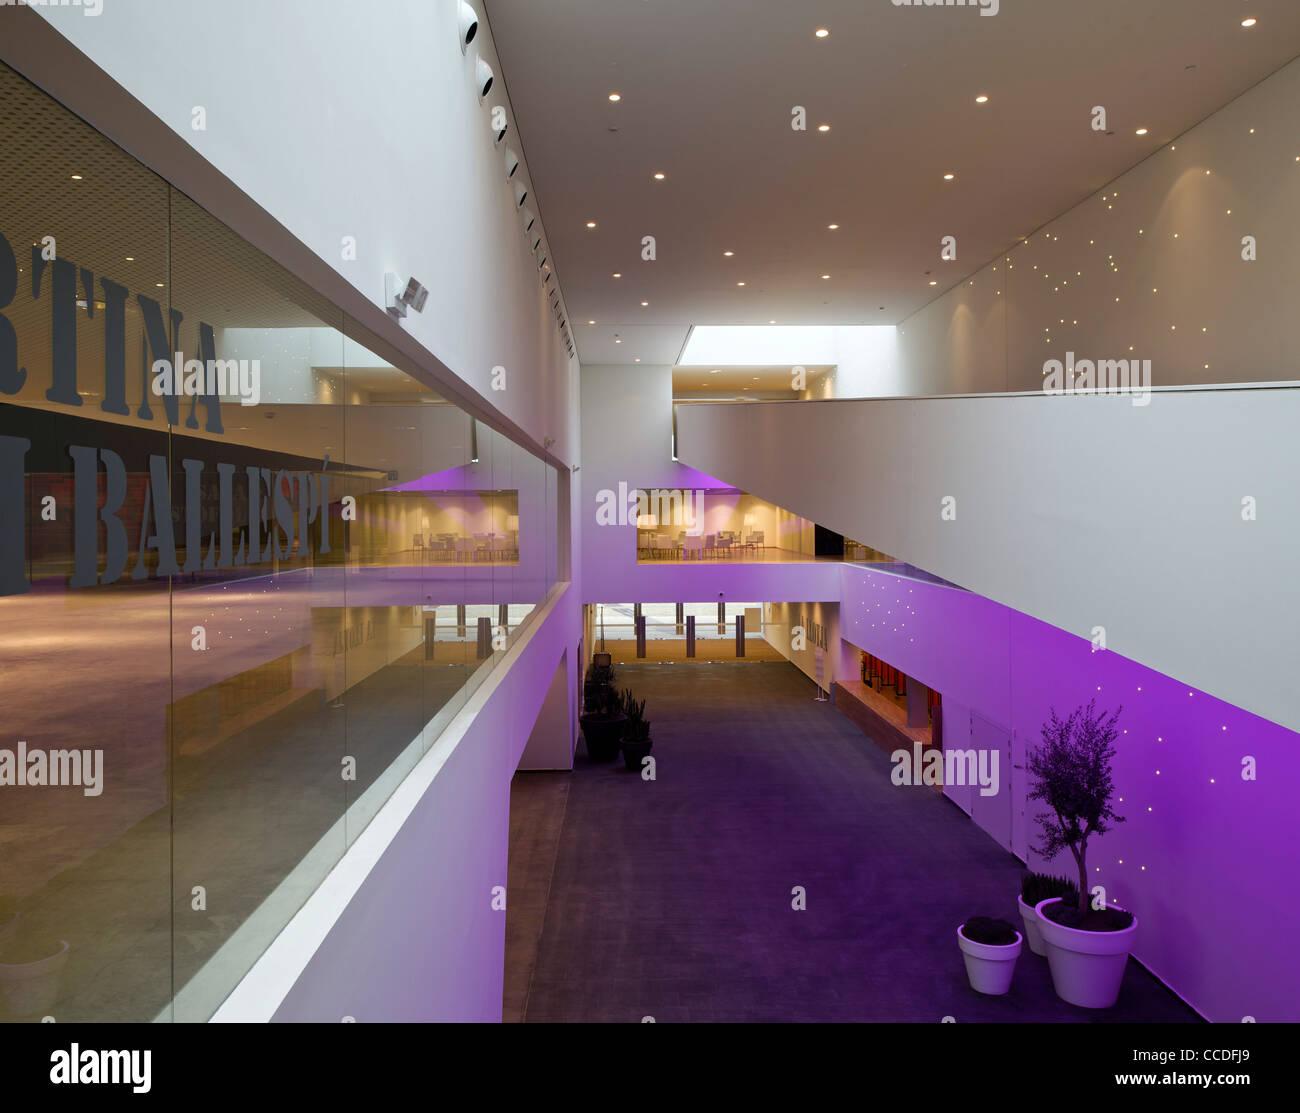 La llotja, congress theater convention center, mecanoo architects ...